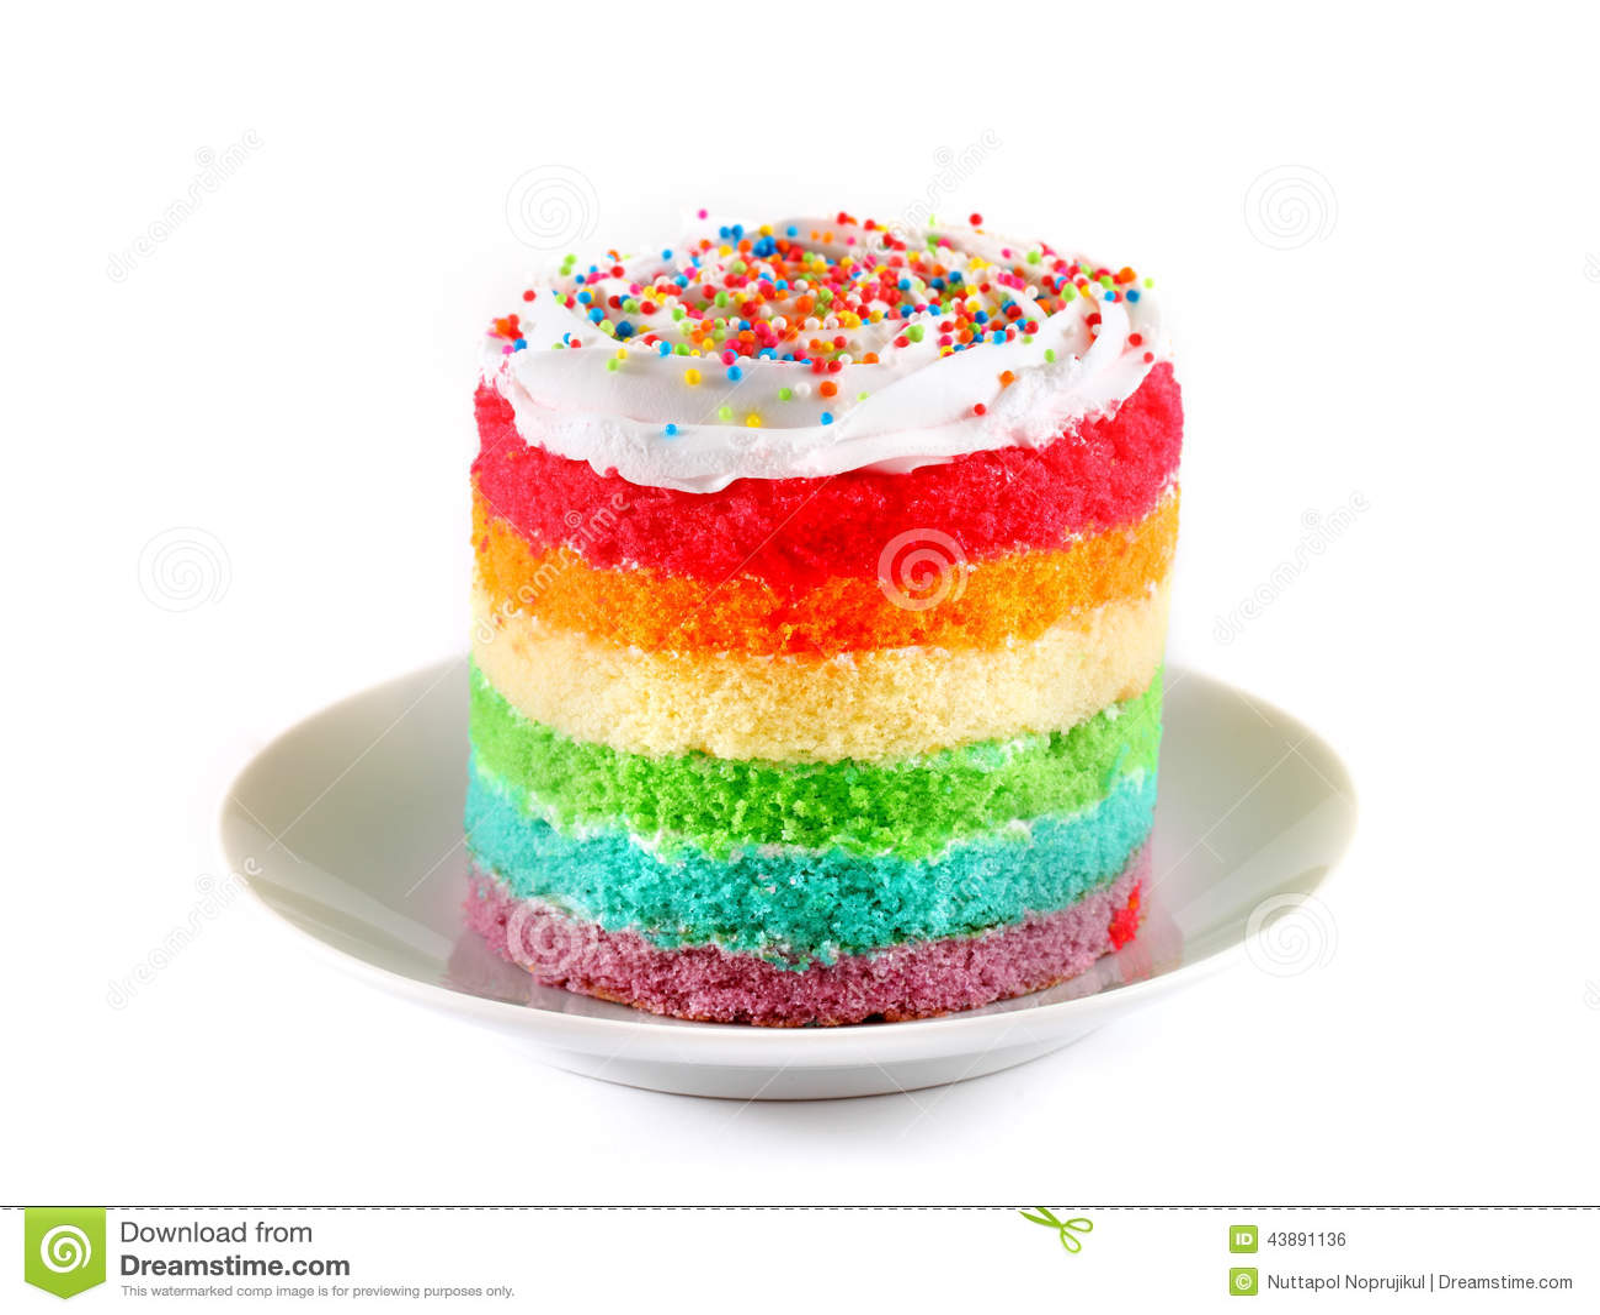 Slice Of Cake On White Plate Rainbow